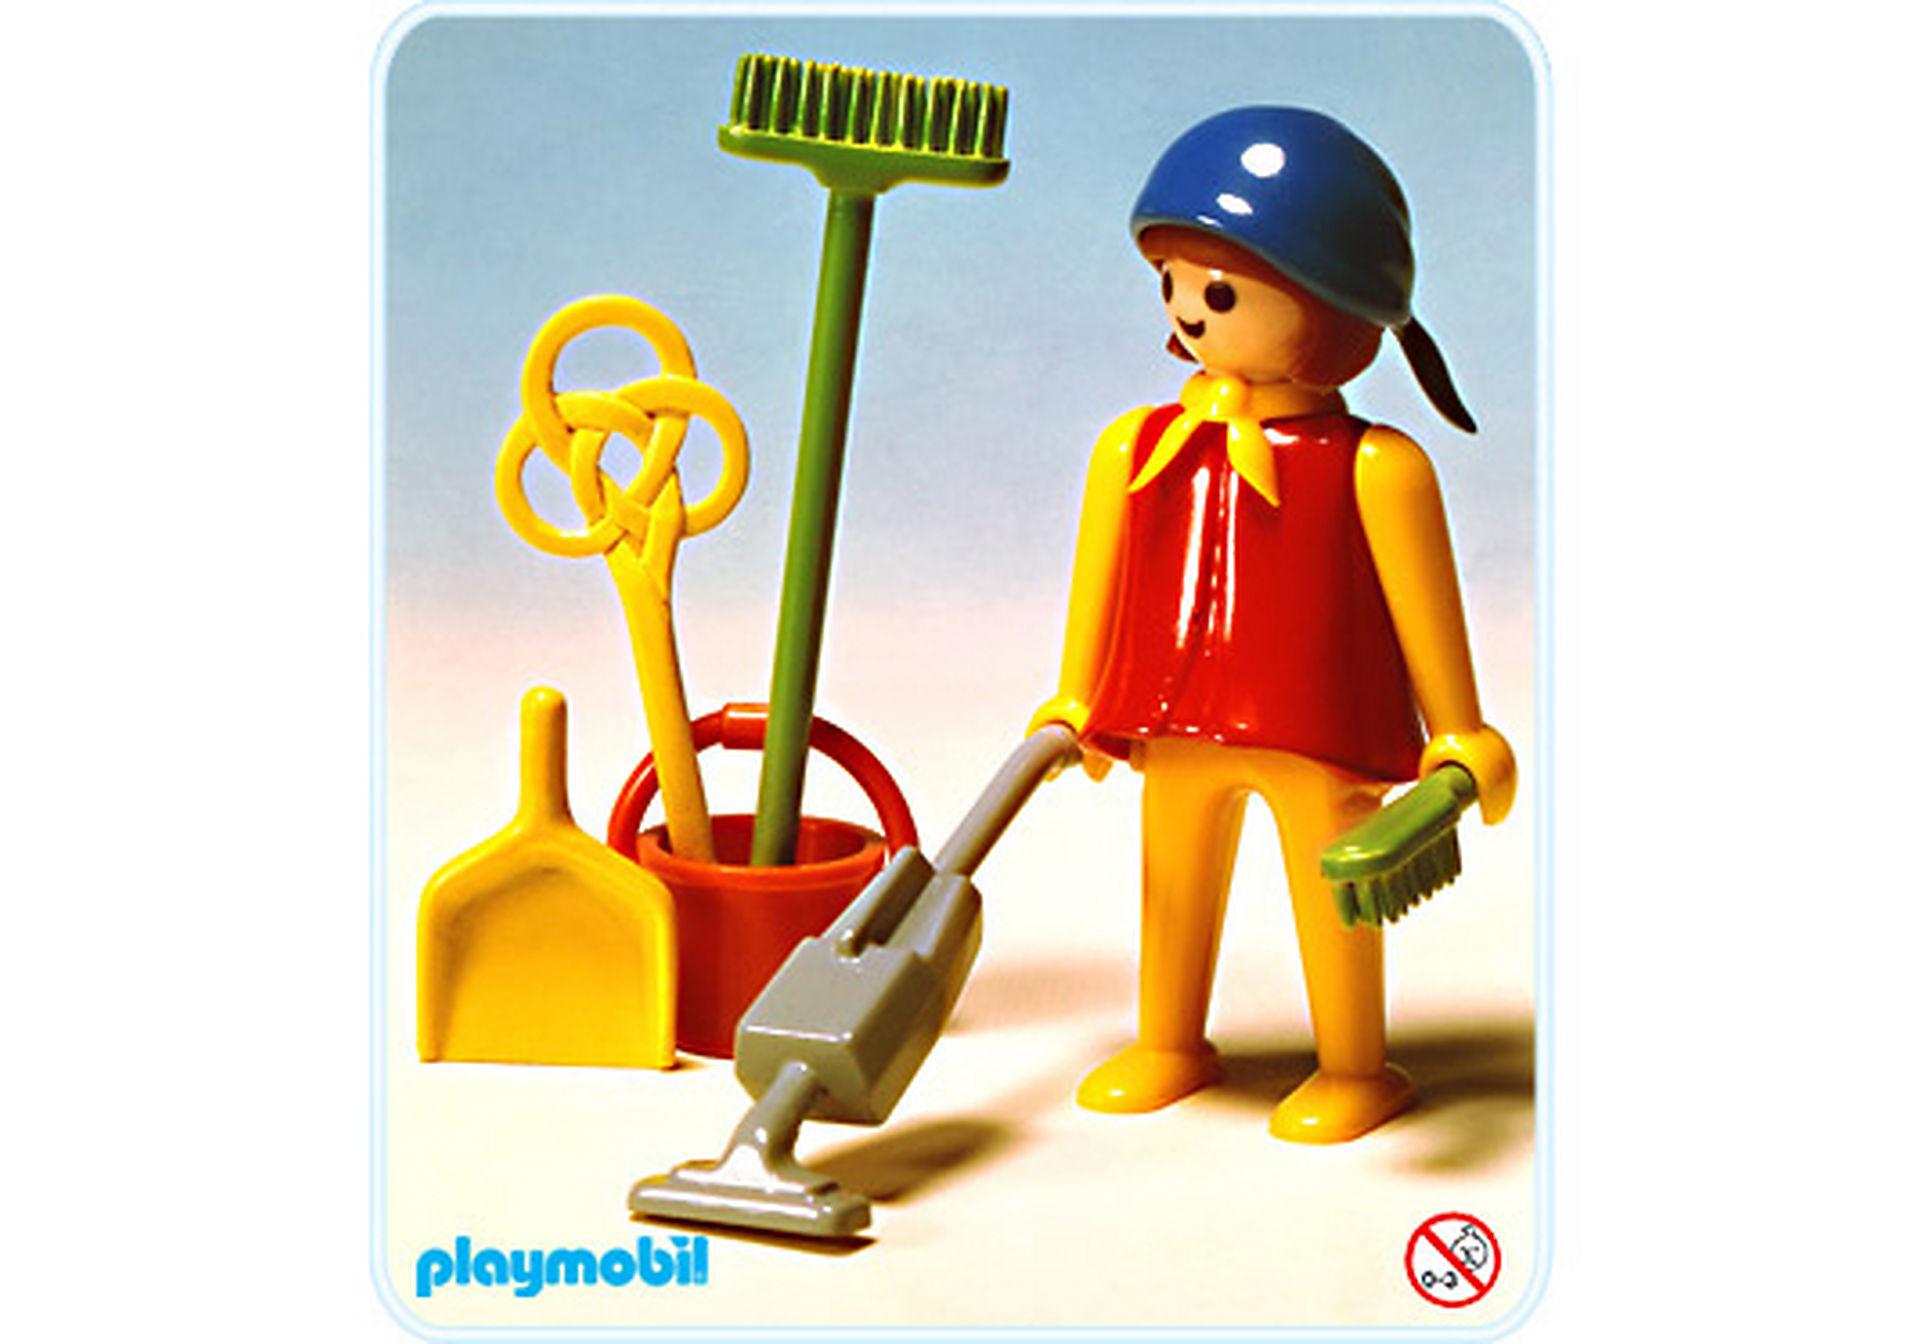 http://media.playmobil.com/i/playmobil/3315-A_product_detail/Raumpflegerin / Staubsauger